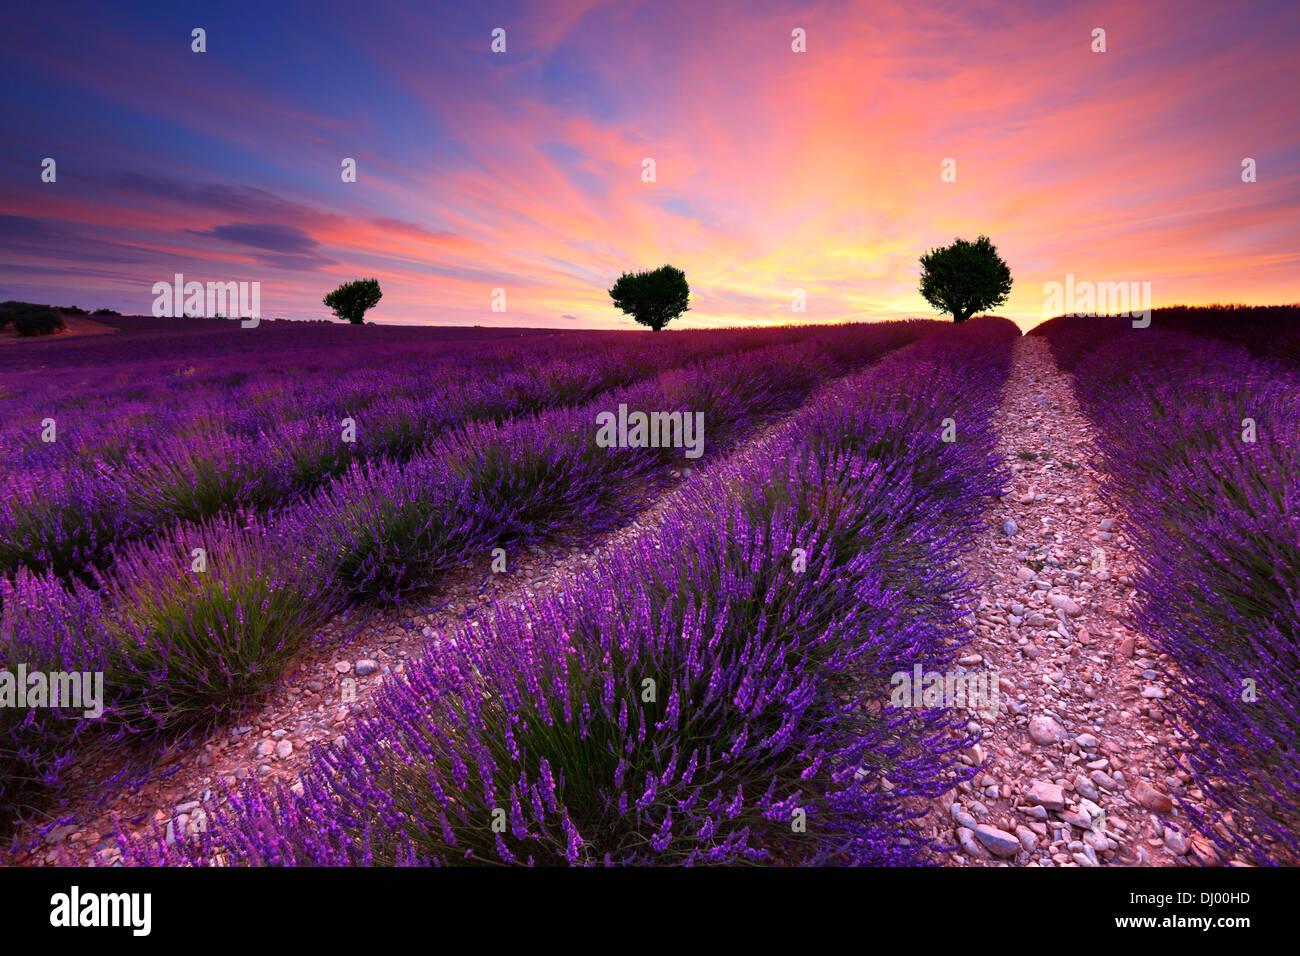 Drei auf dem Hügel im Lavendelfeld bei Sonnenuntergang. Frankreich-Provence. Stockbild